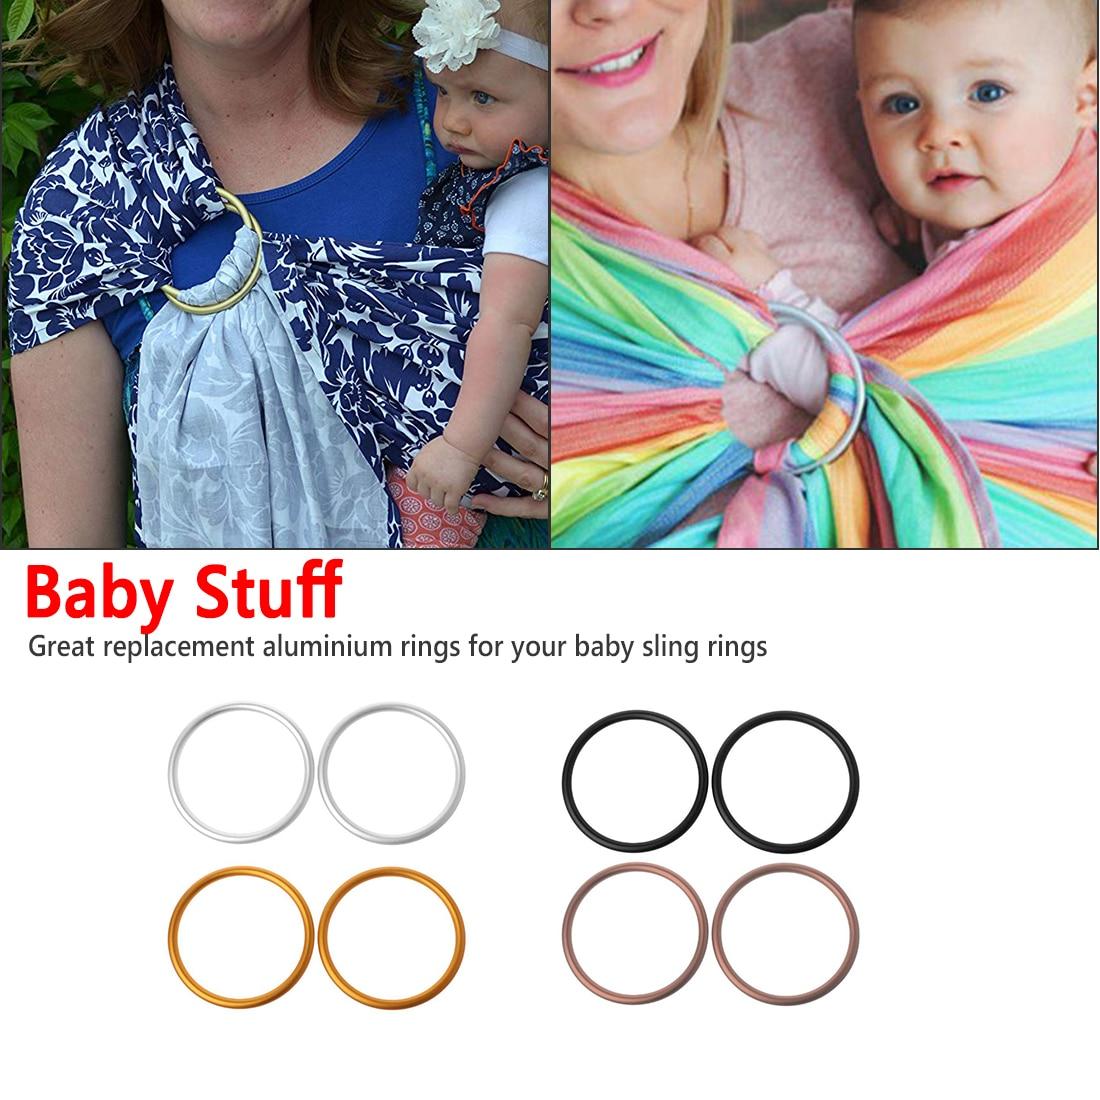 Premium Aluminum Rings For Baby Slings Baby Carriers Accessories 4Colors For Baby Carriers & Slings